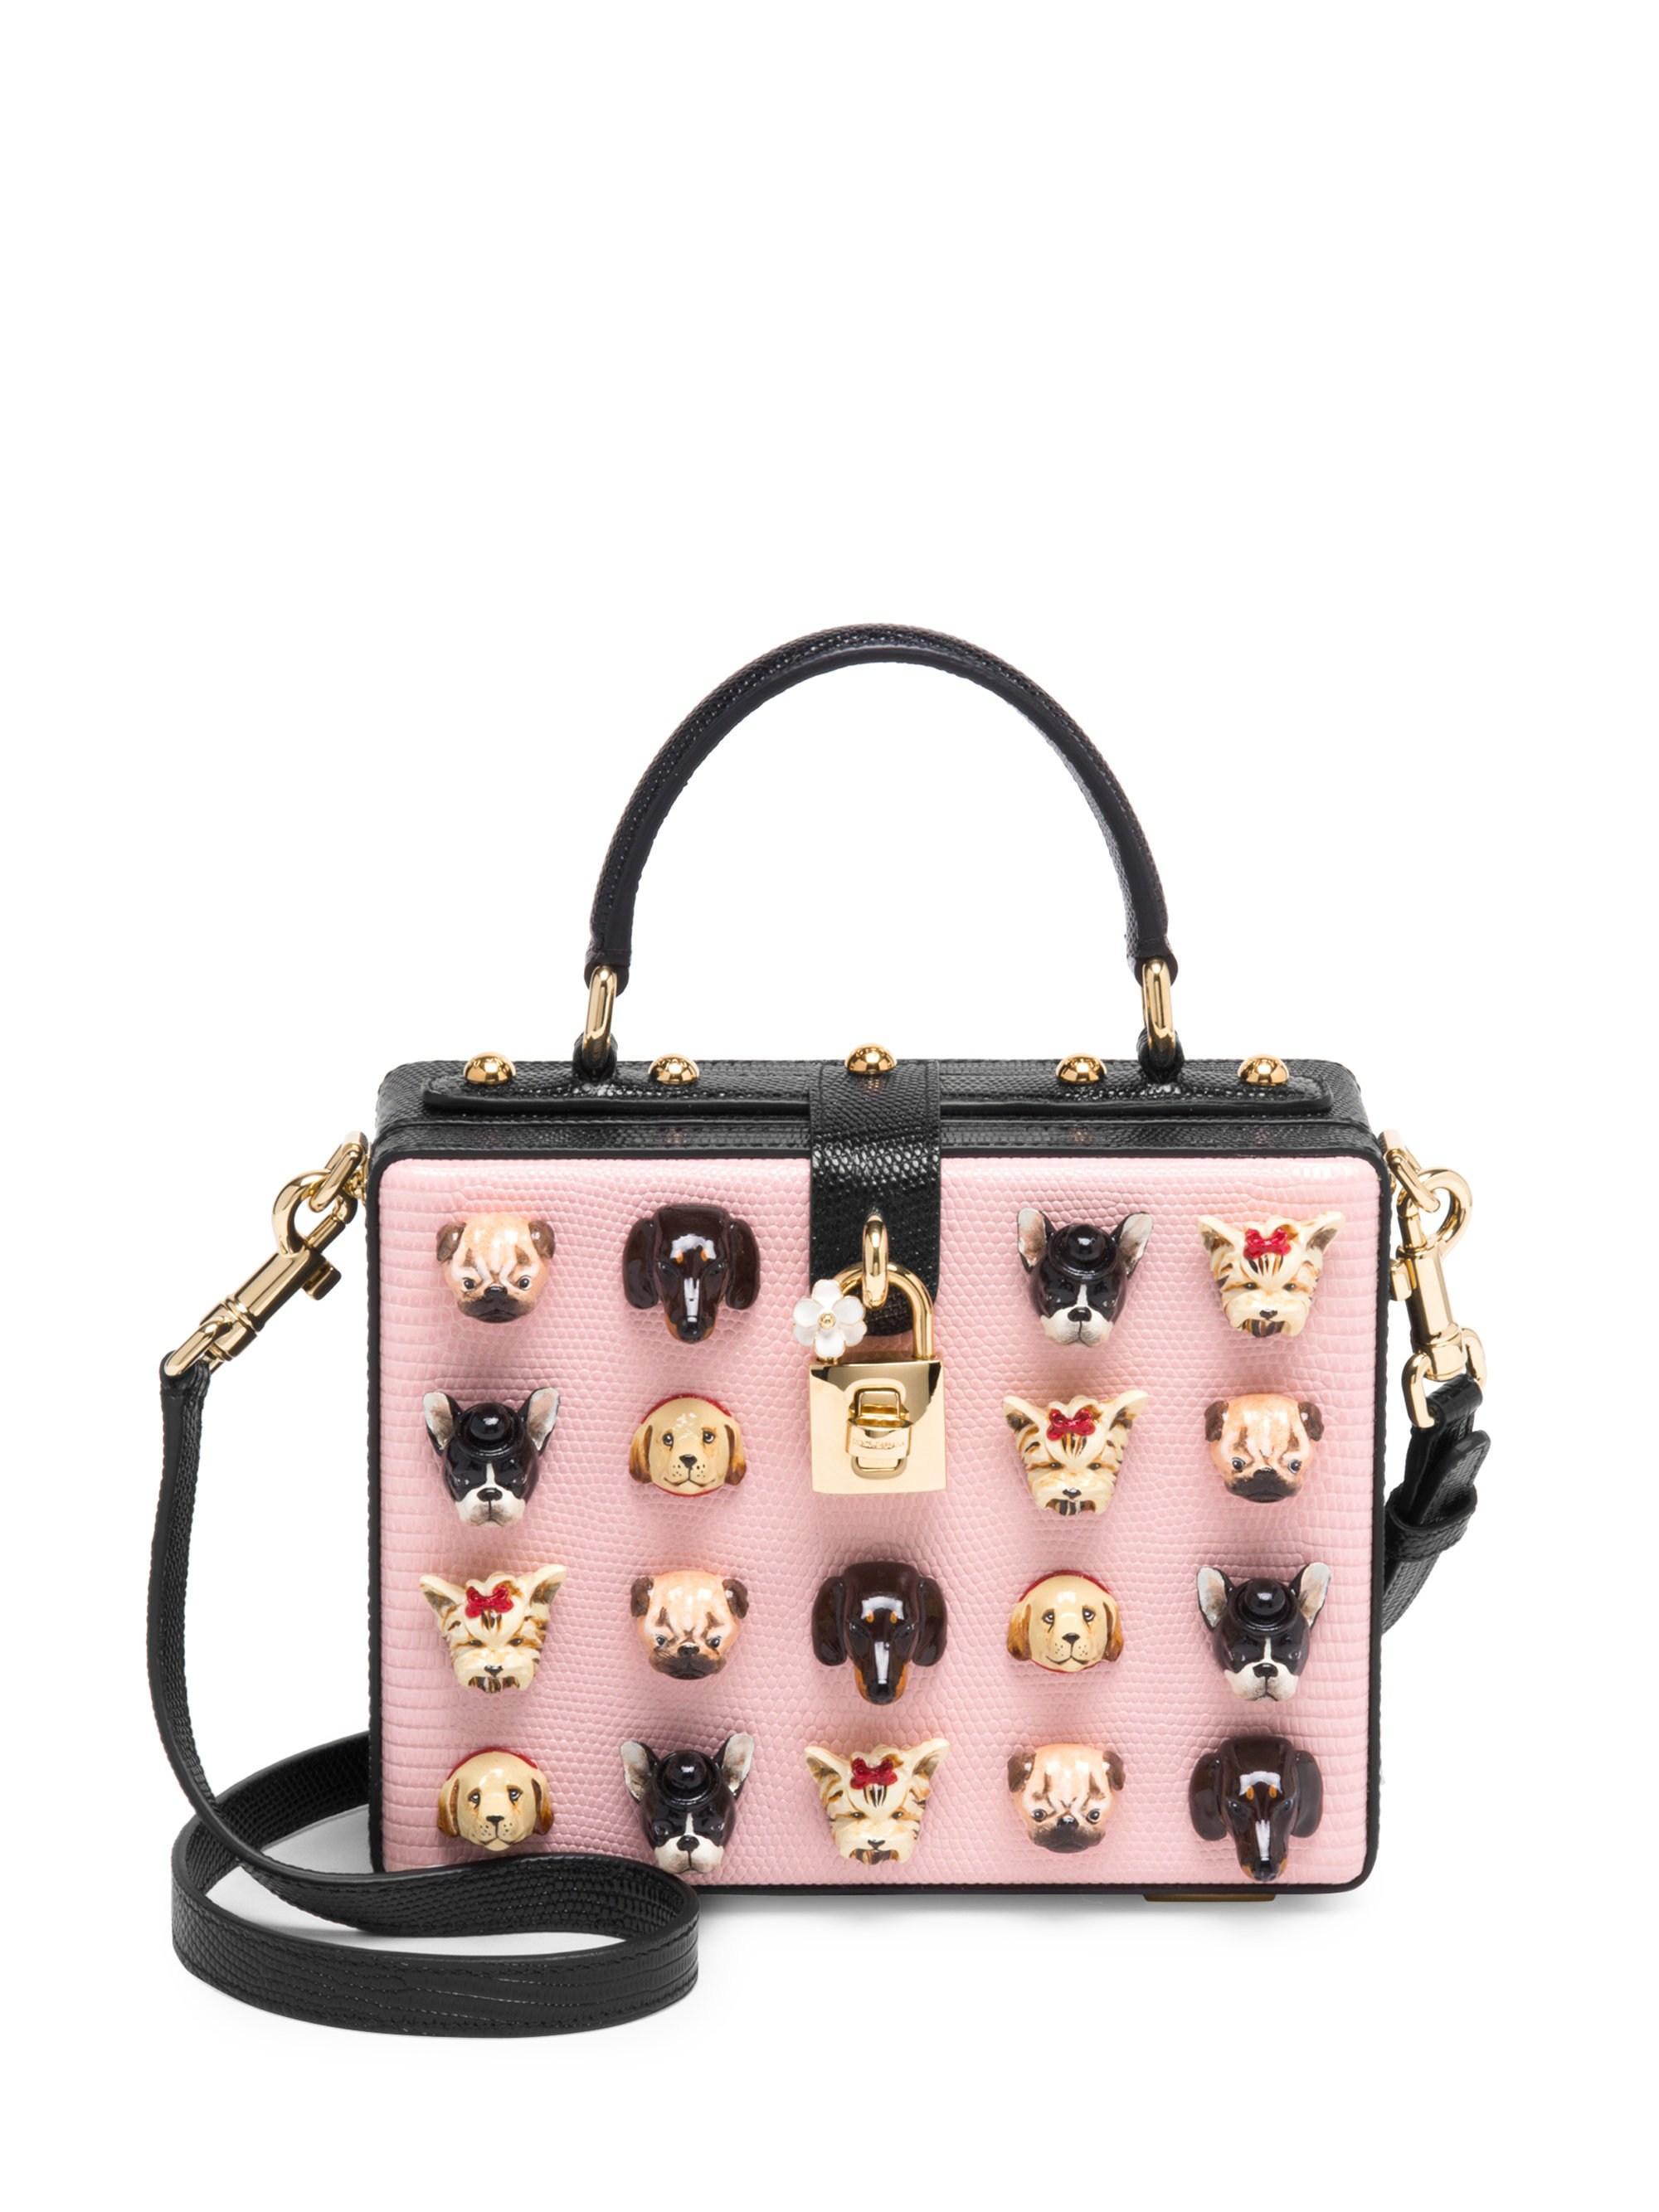 da5046d3b894 Dolce   Gabbana. Women s Dog Embellished Leather Box Bag - Pink Black